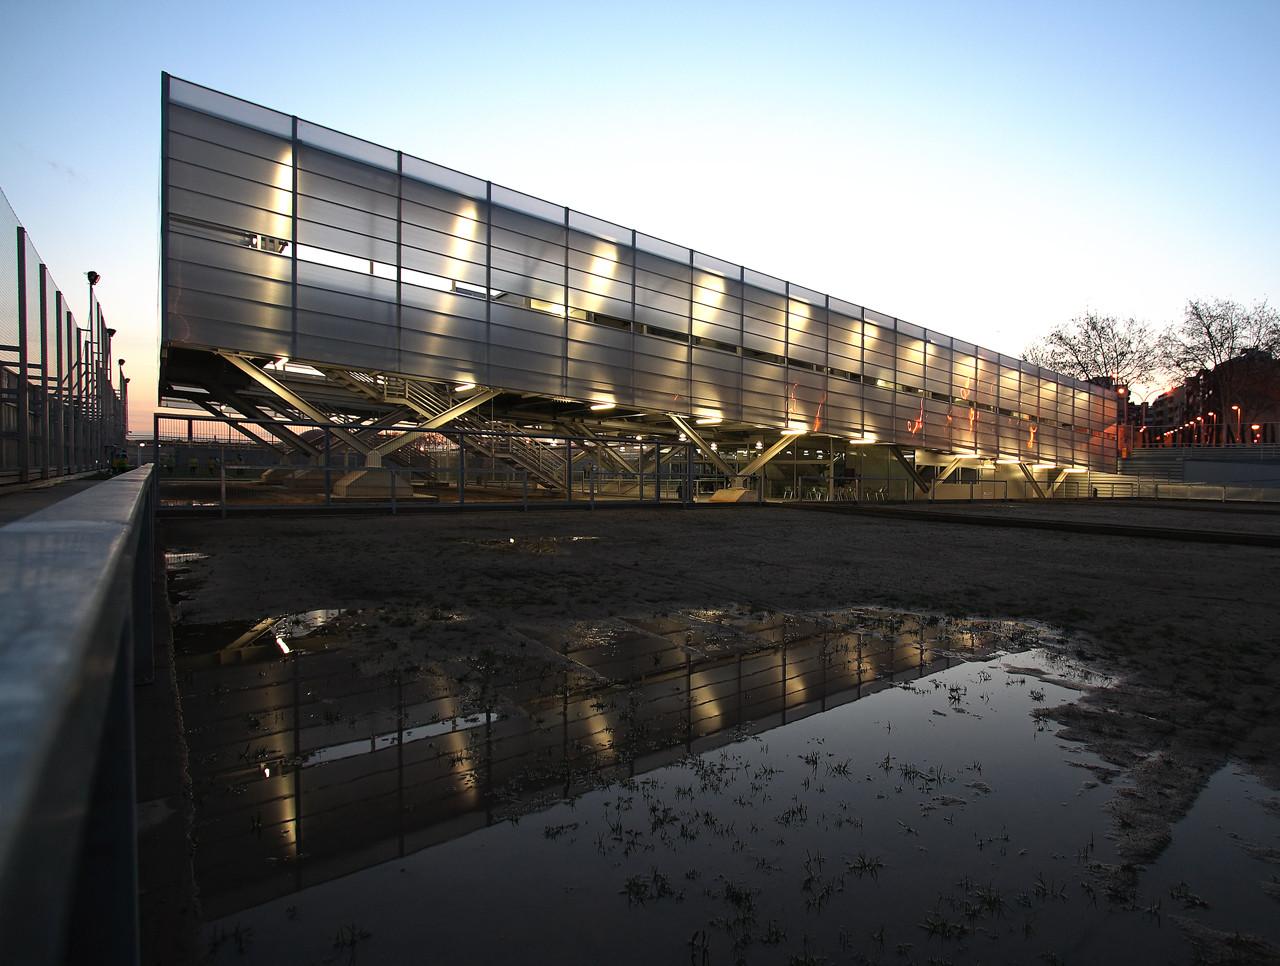 Zona Deportiva Salvador Espriu / Soldevila Arquitectos, © M. Grassi